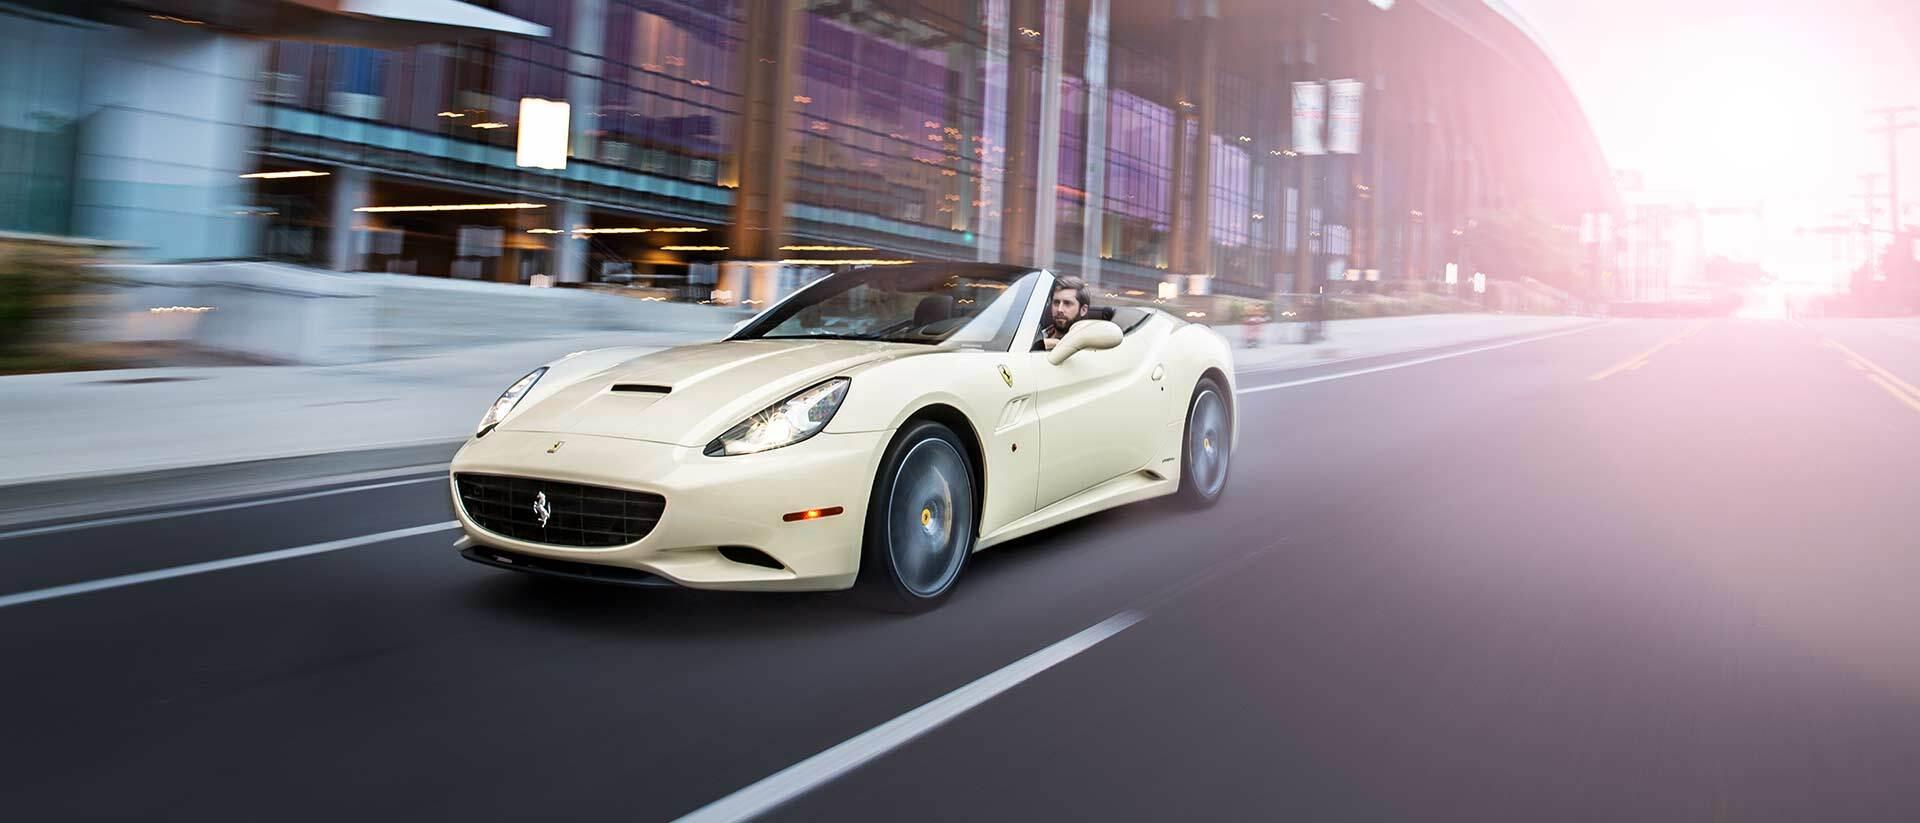 Dealership Nashville TN | Used Cars Global Motorsports Inc